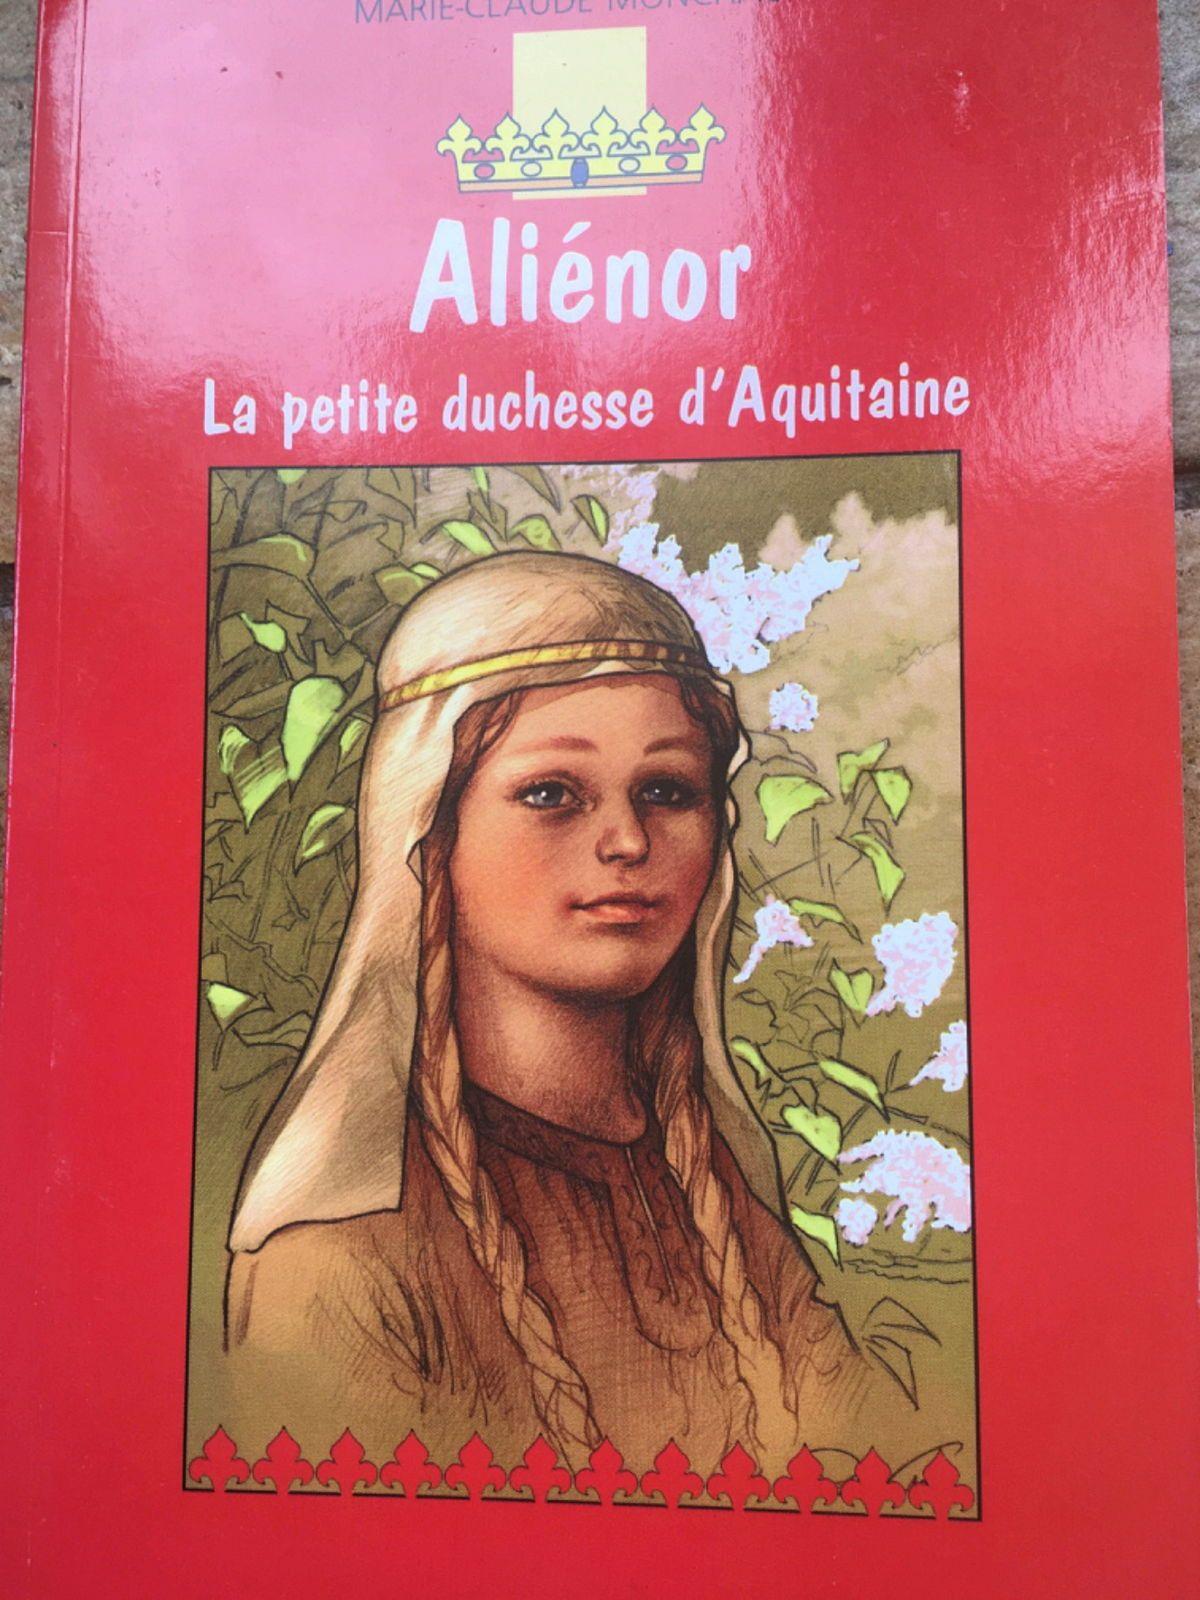 Propose livre: Alienor la petite duchesse d'Aquitaine